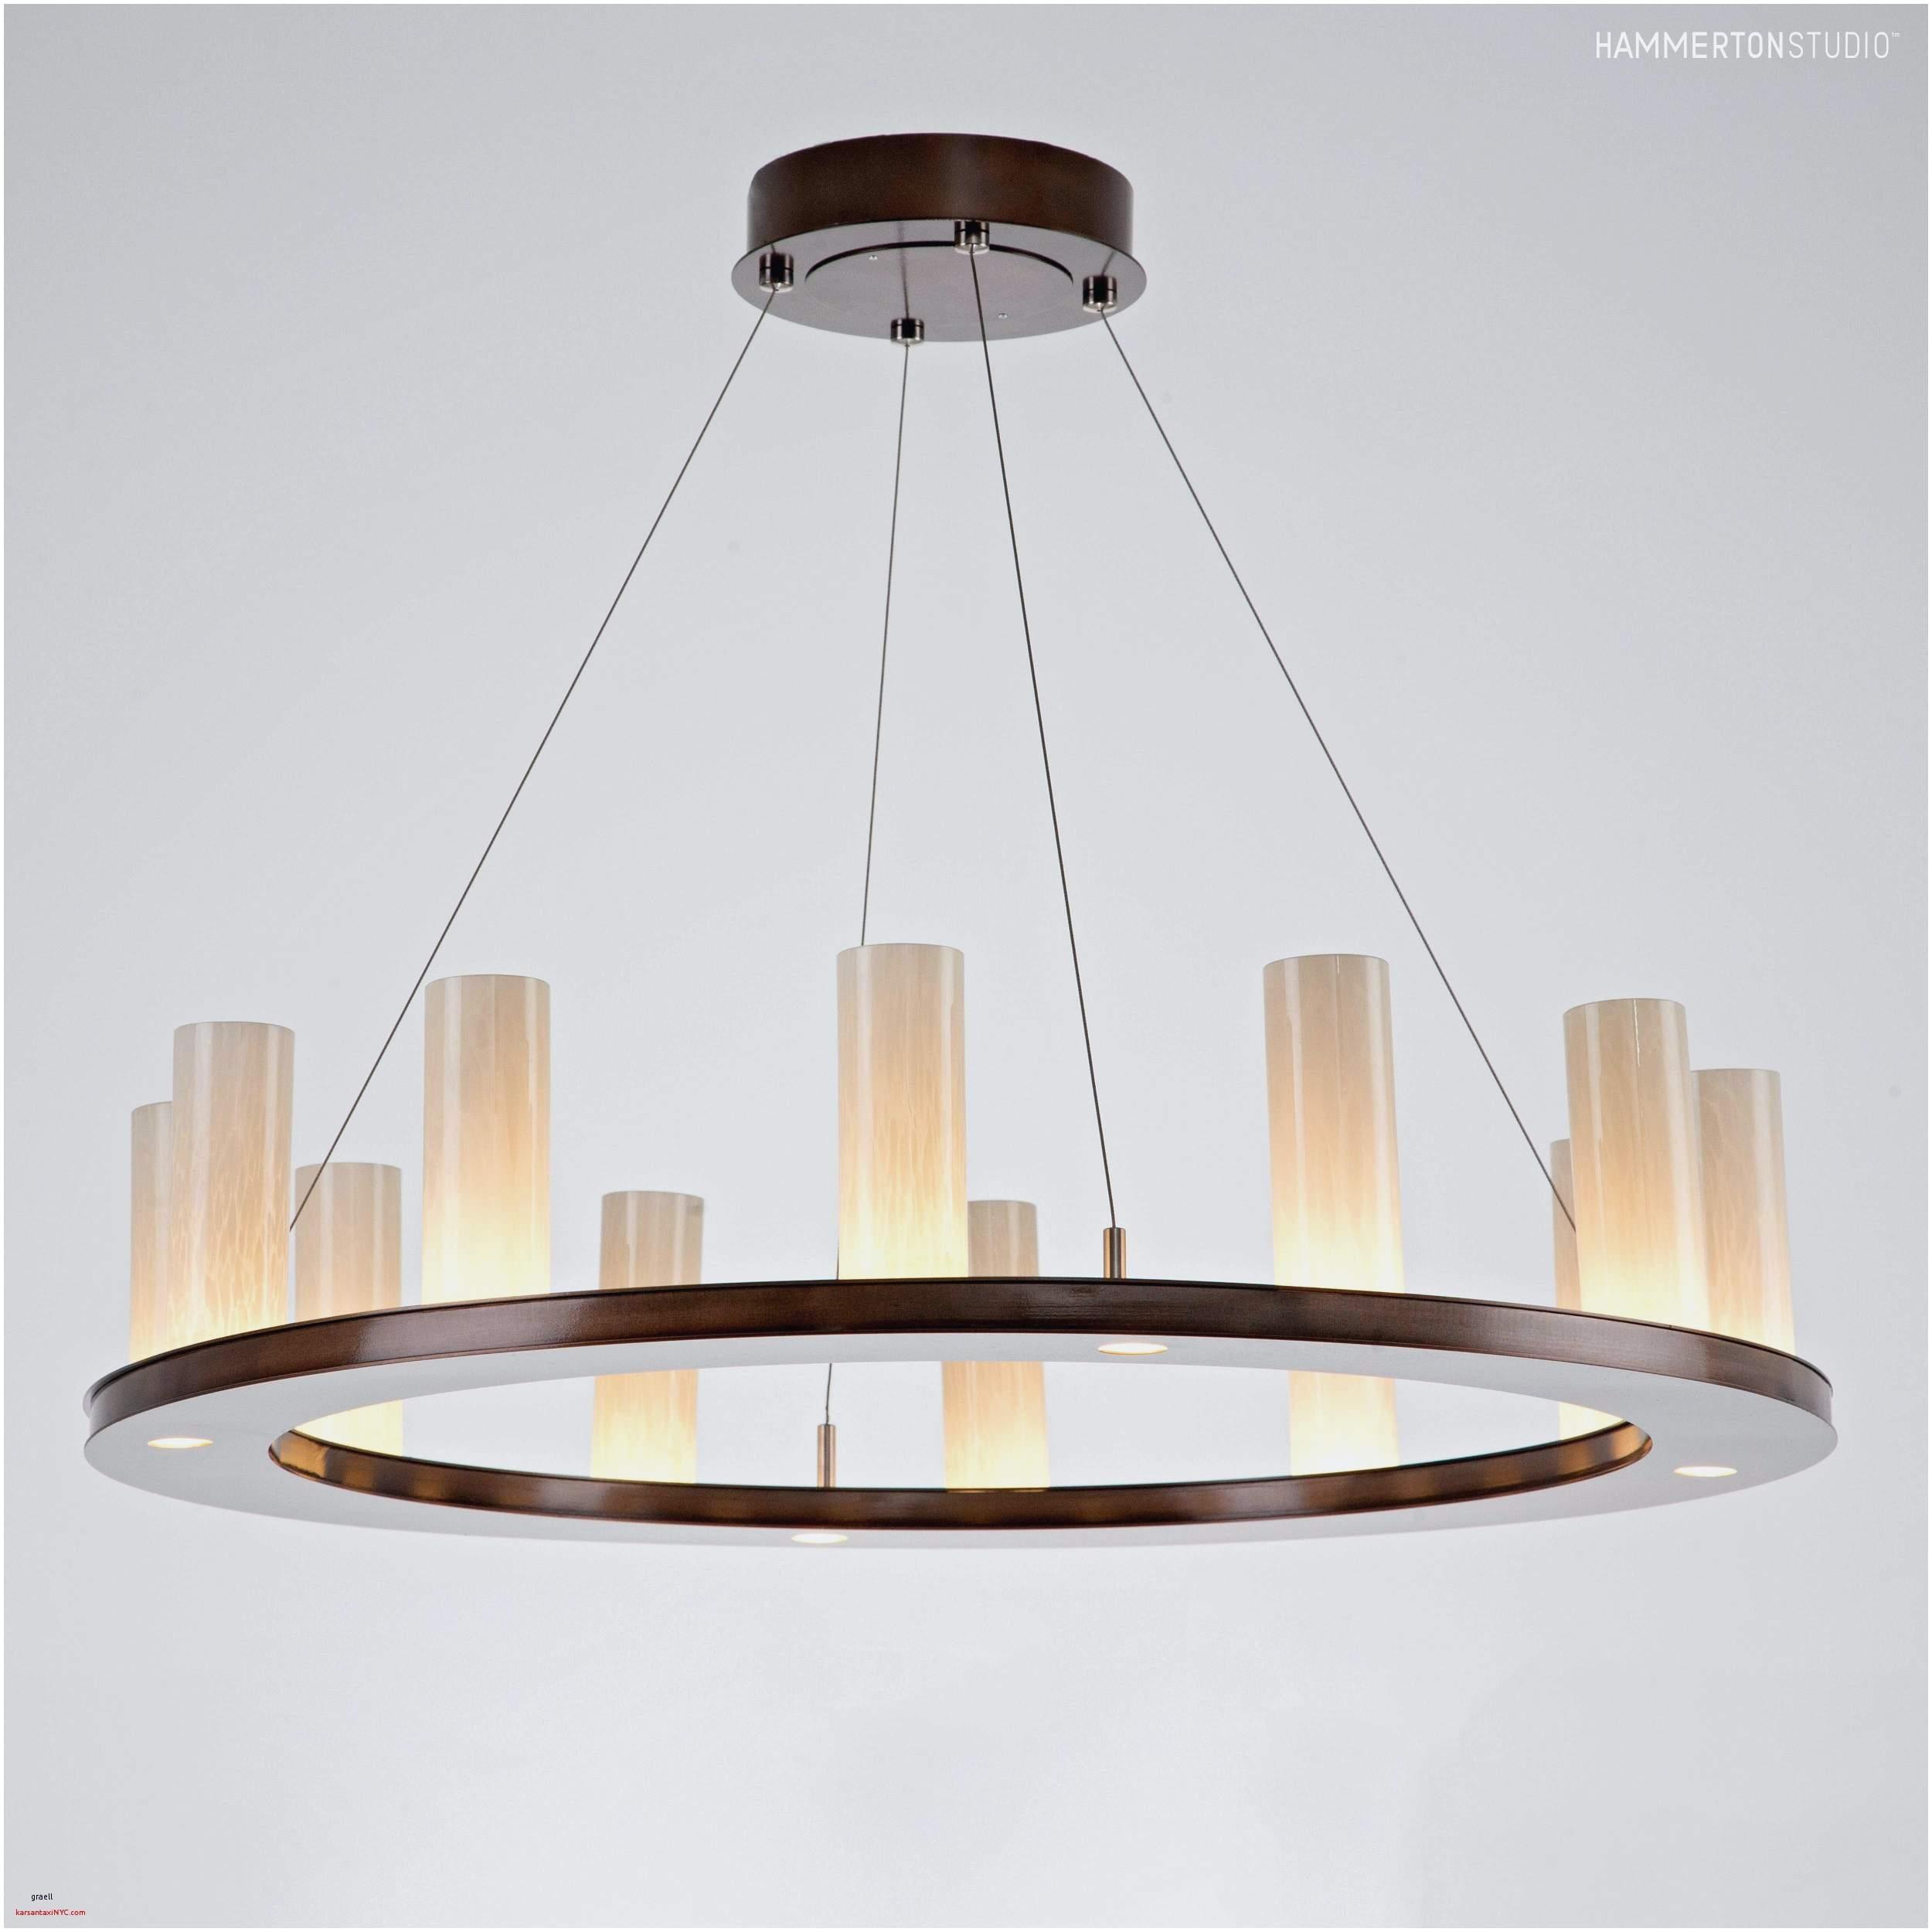 pendant new upholstery services 0d fresh modern track lighting from modern track lighting source 66 42